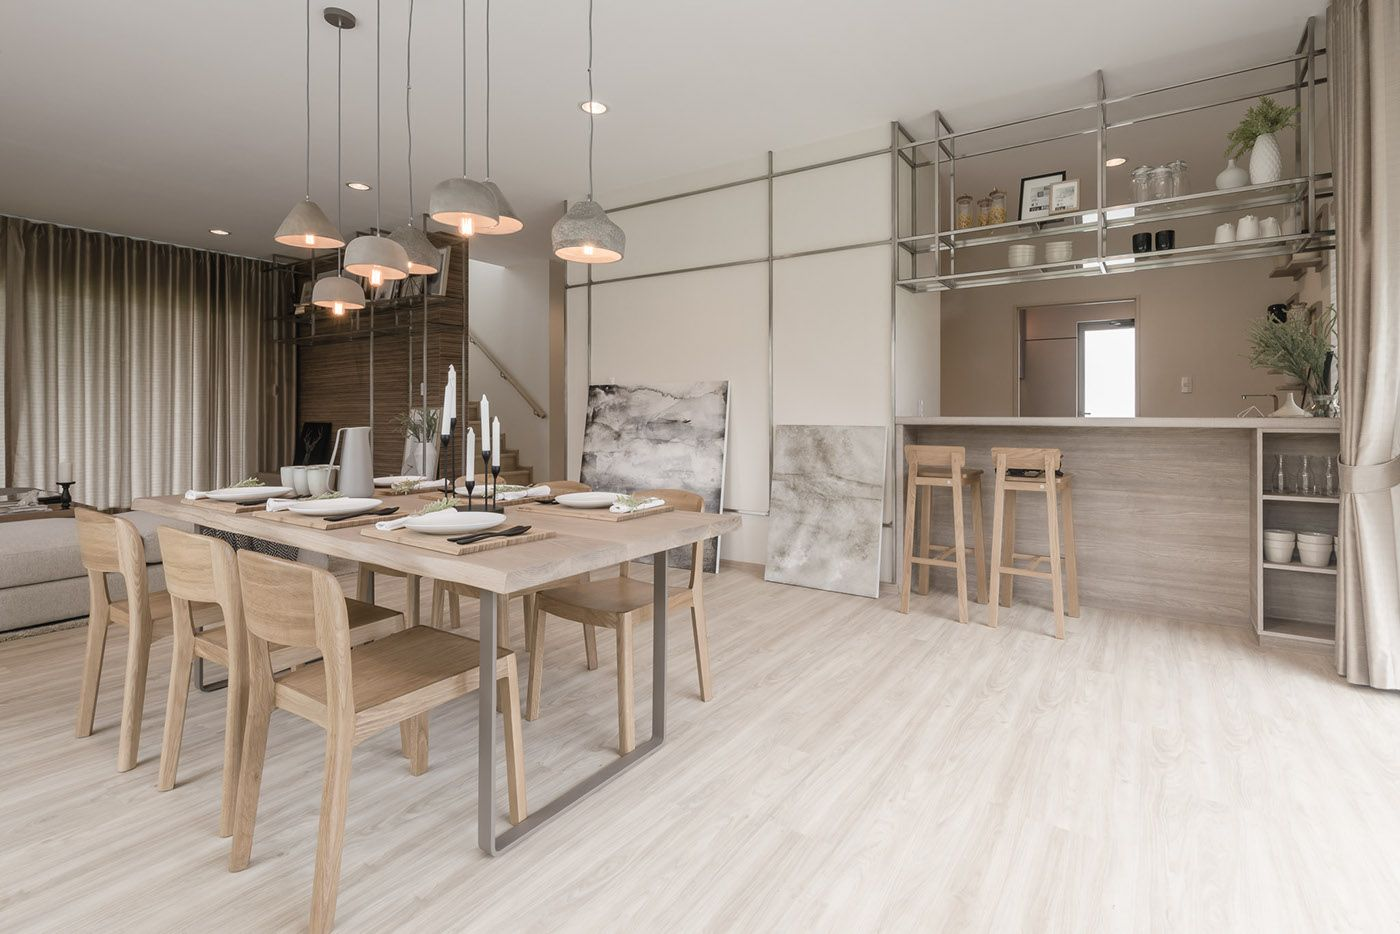 CREA Residences Khaoyai by SCG Heim x N7A Architects on Behance ...